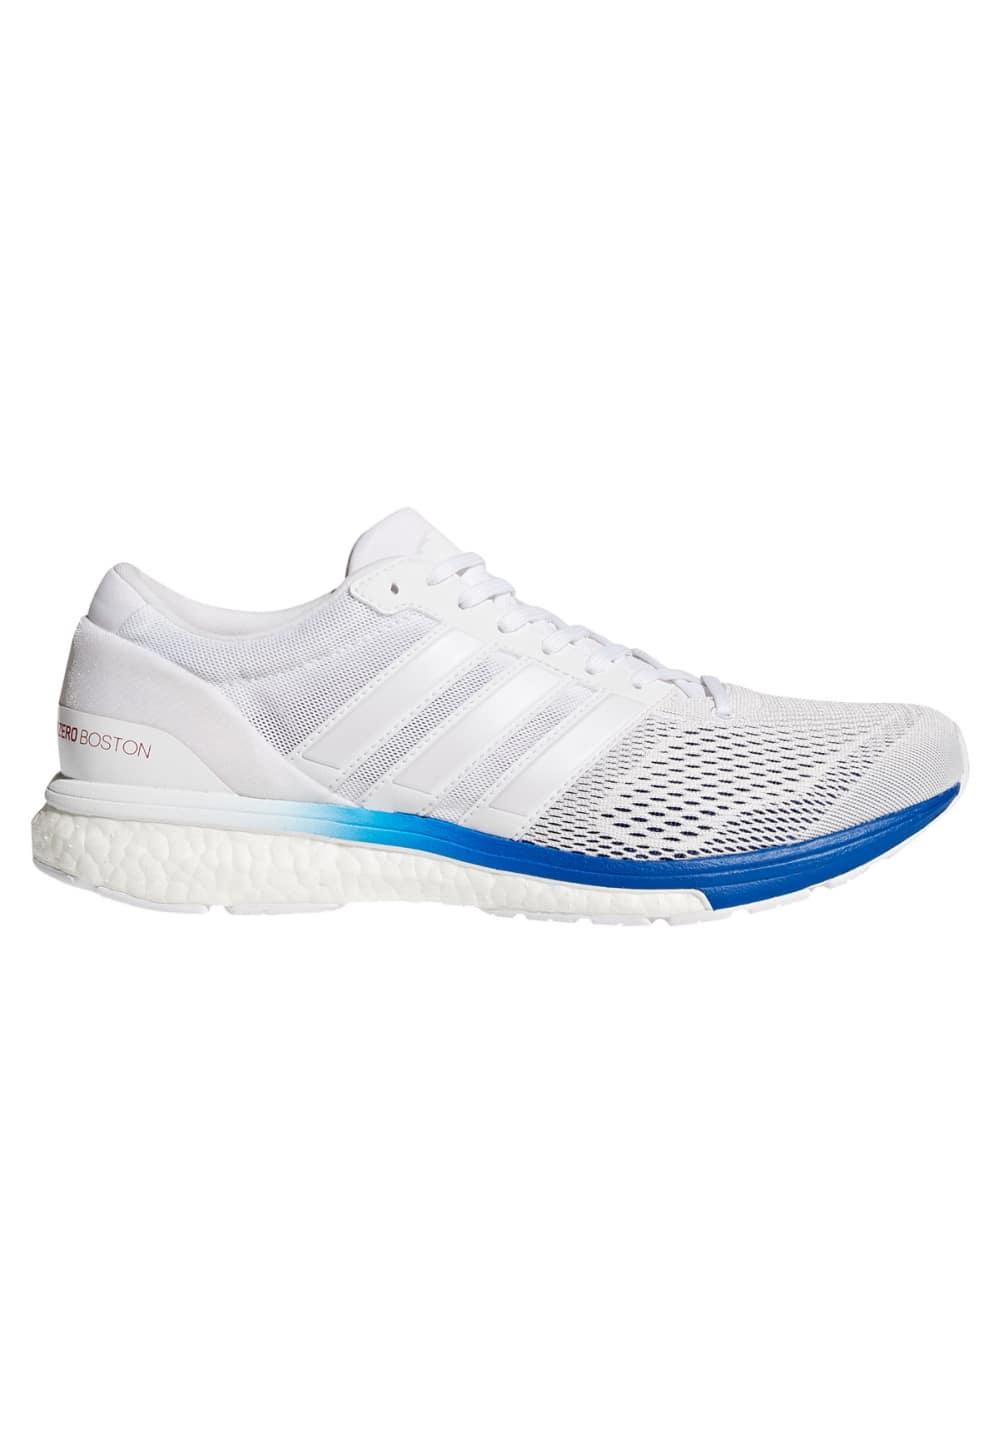 nouveau concept e4403 5b067 adidas Adizero Boston 6 Aktiv - Running shoes - White